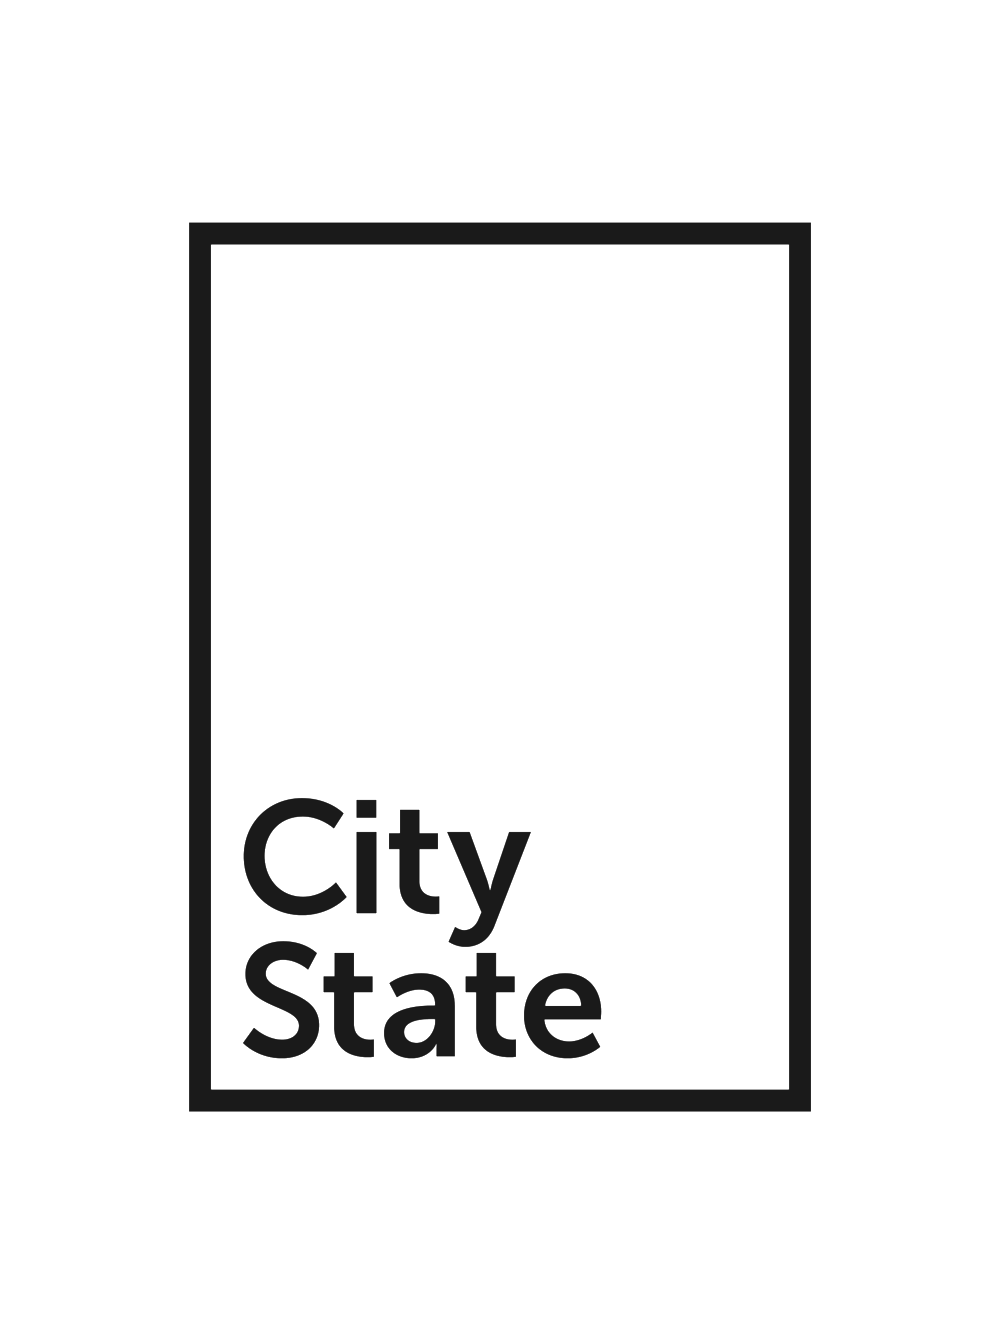 CityState---Original.png